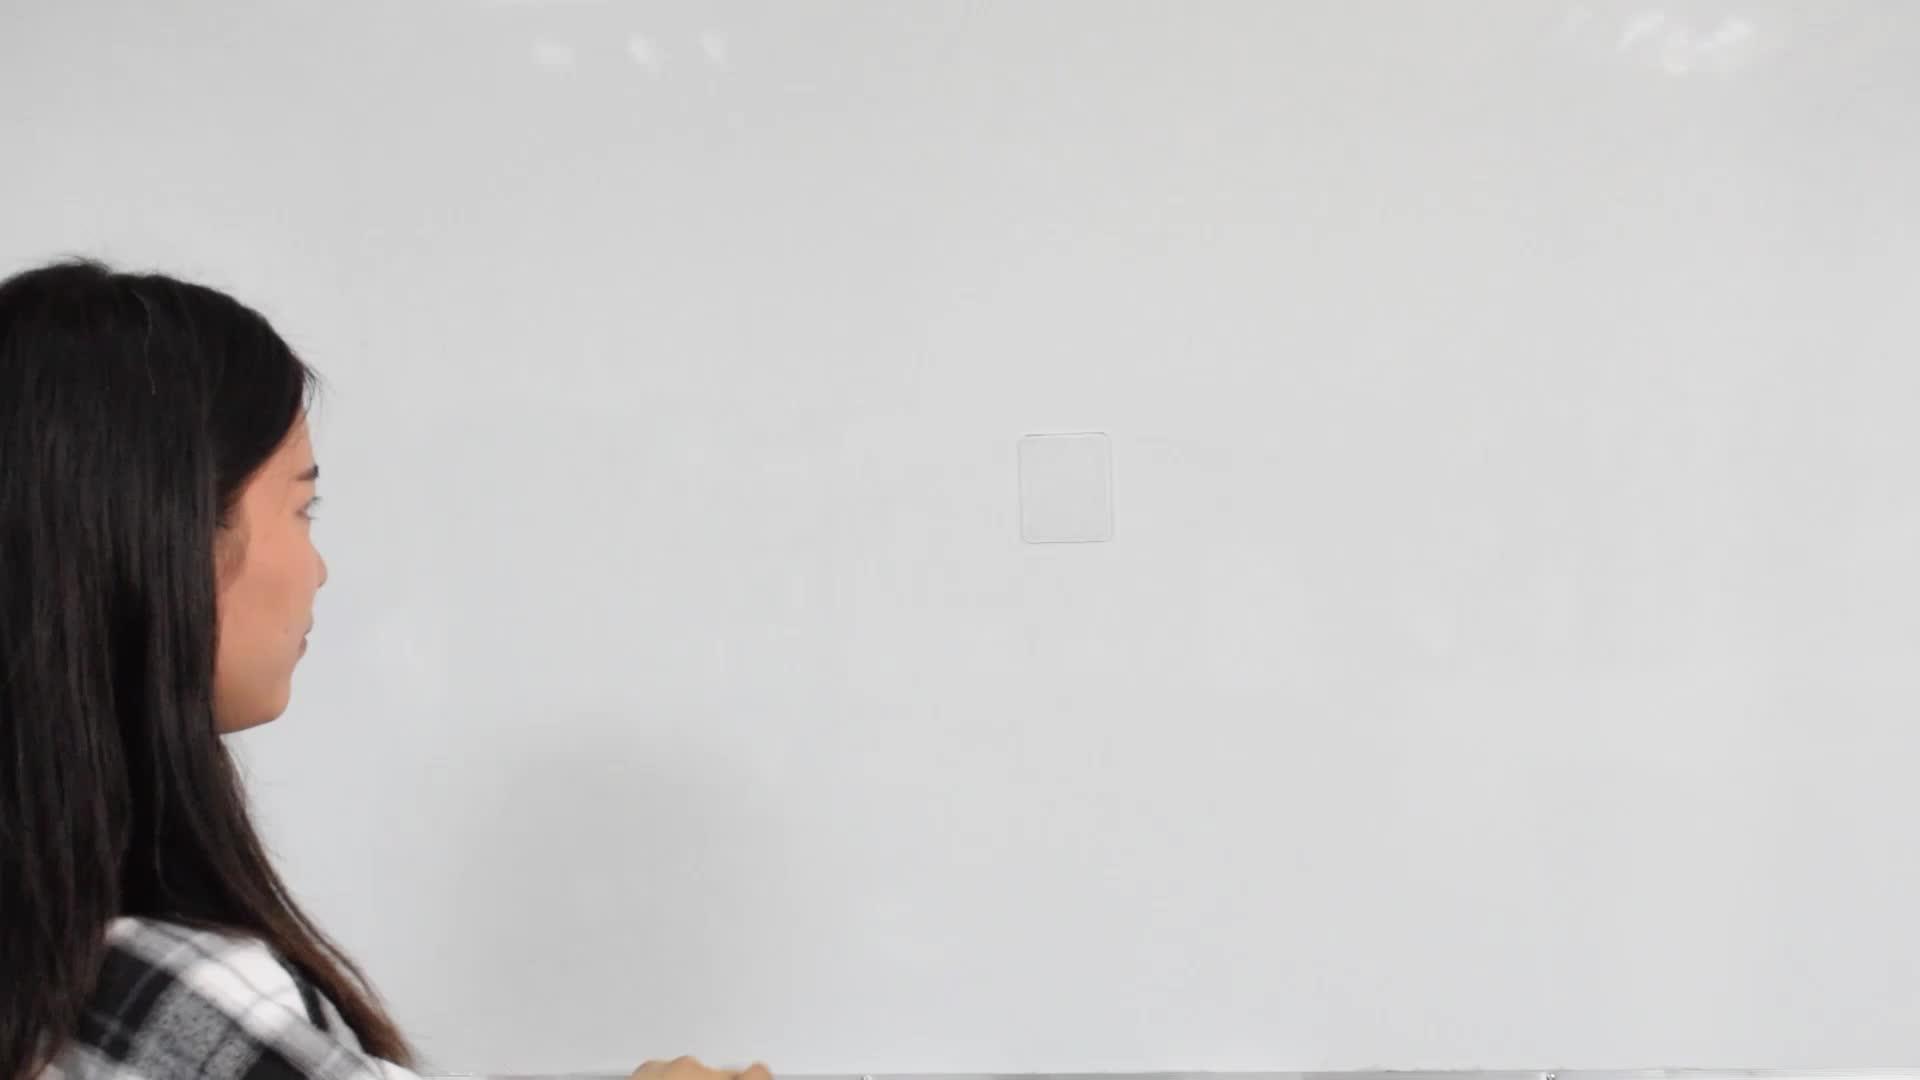 Alibaba Heiße Produkte Anti-rutsch-pad Tabelle PU Auto Telefon Antibelegauflage